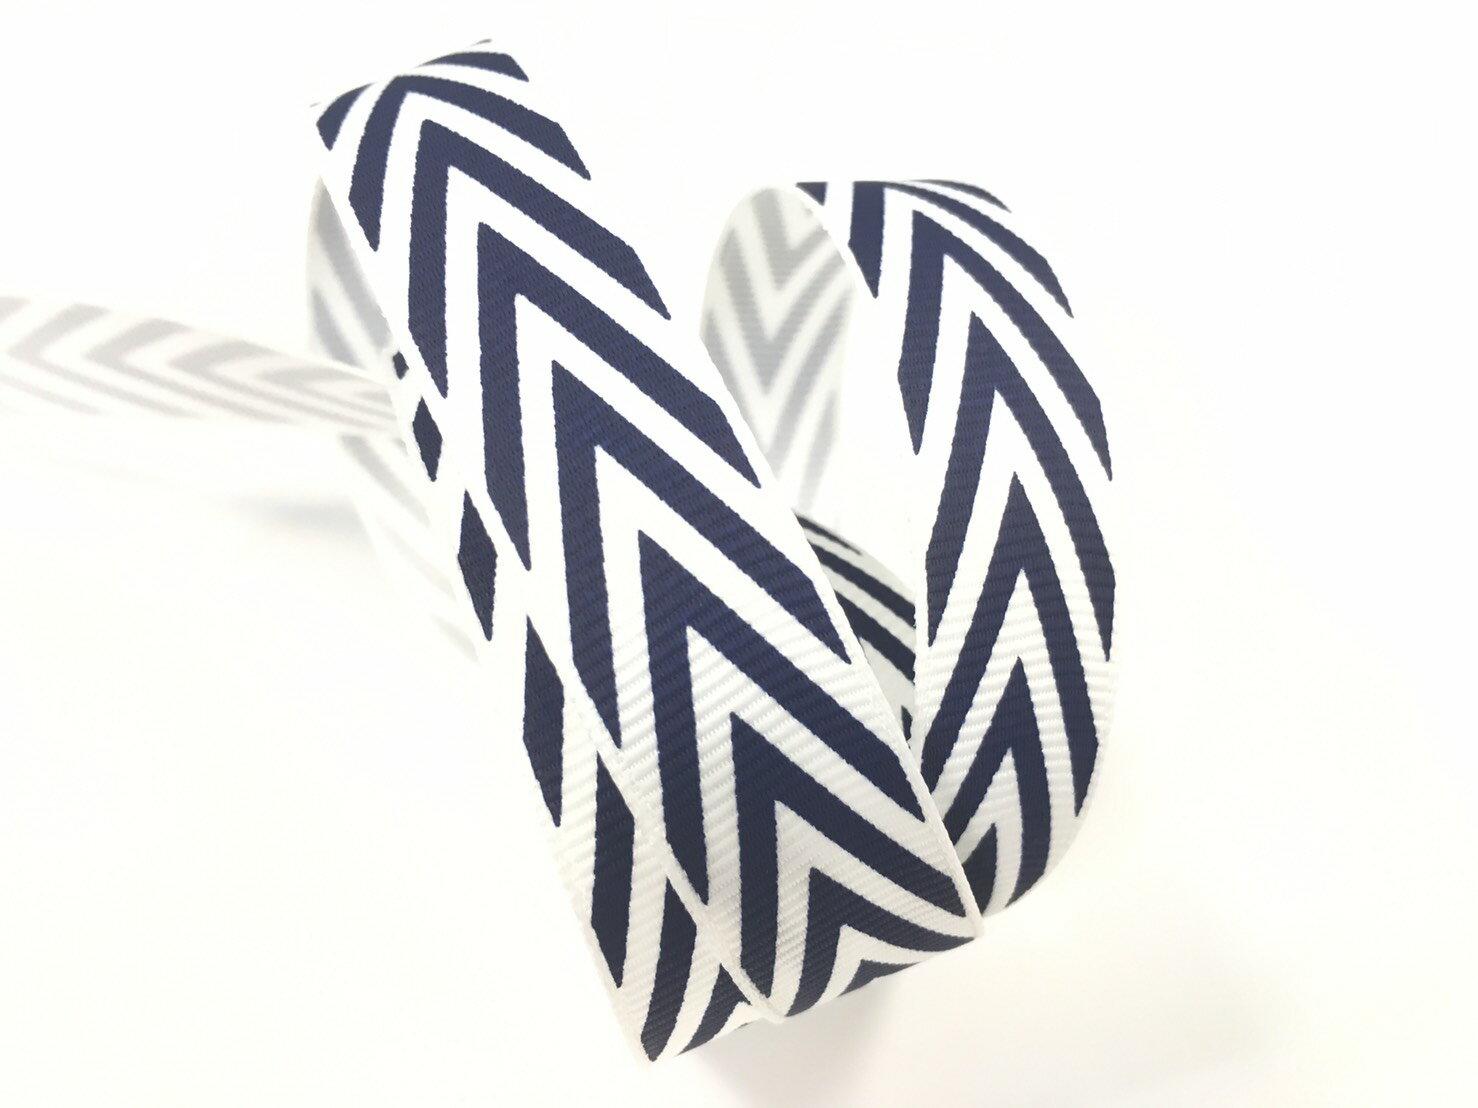 【Crystal Rose緞帶專賣店】羅紋緞帶箭頭15mm3碼裝(3色) 1